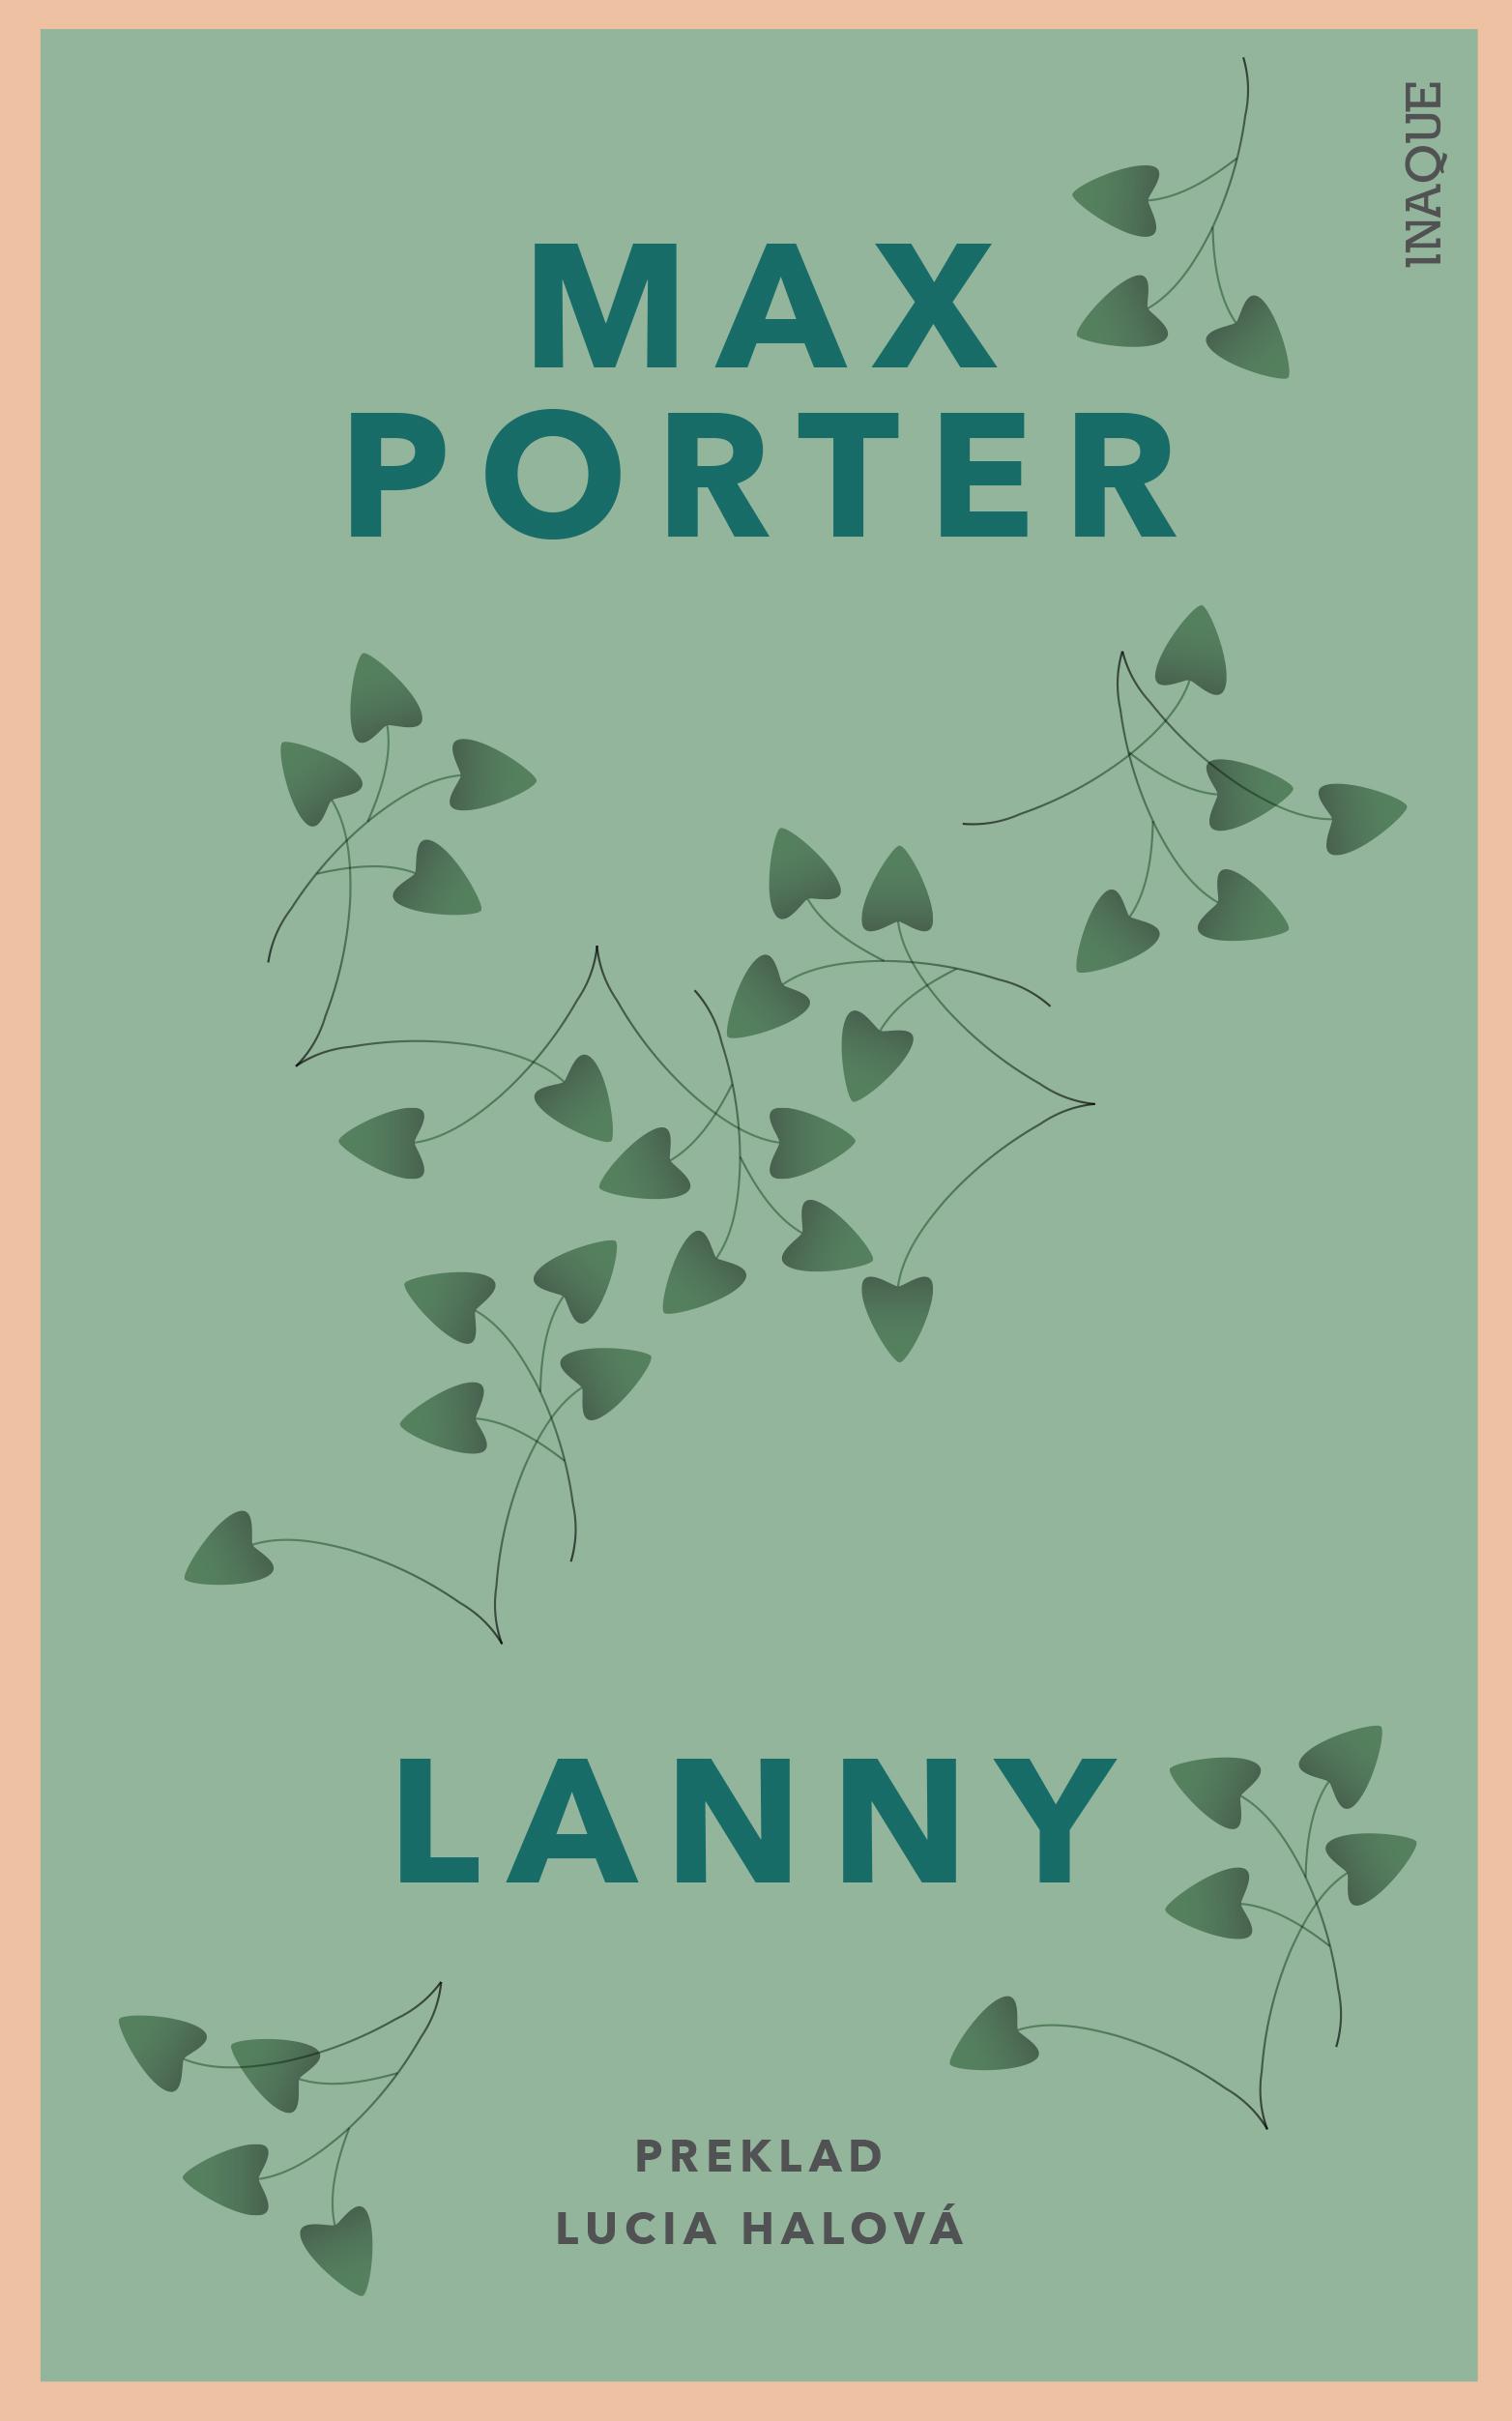 Max Porter_Lanny